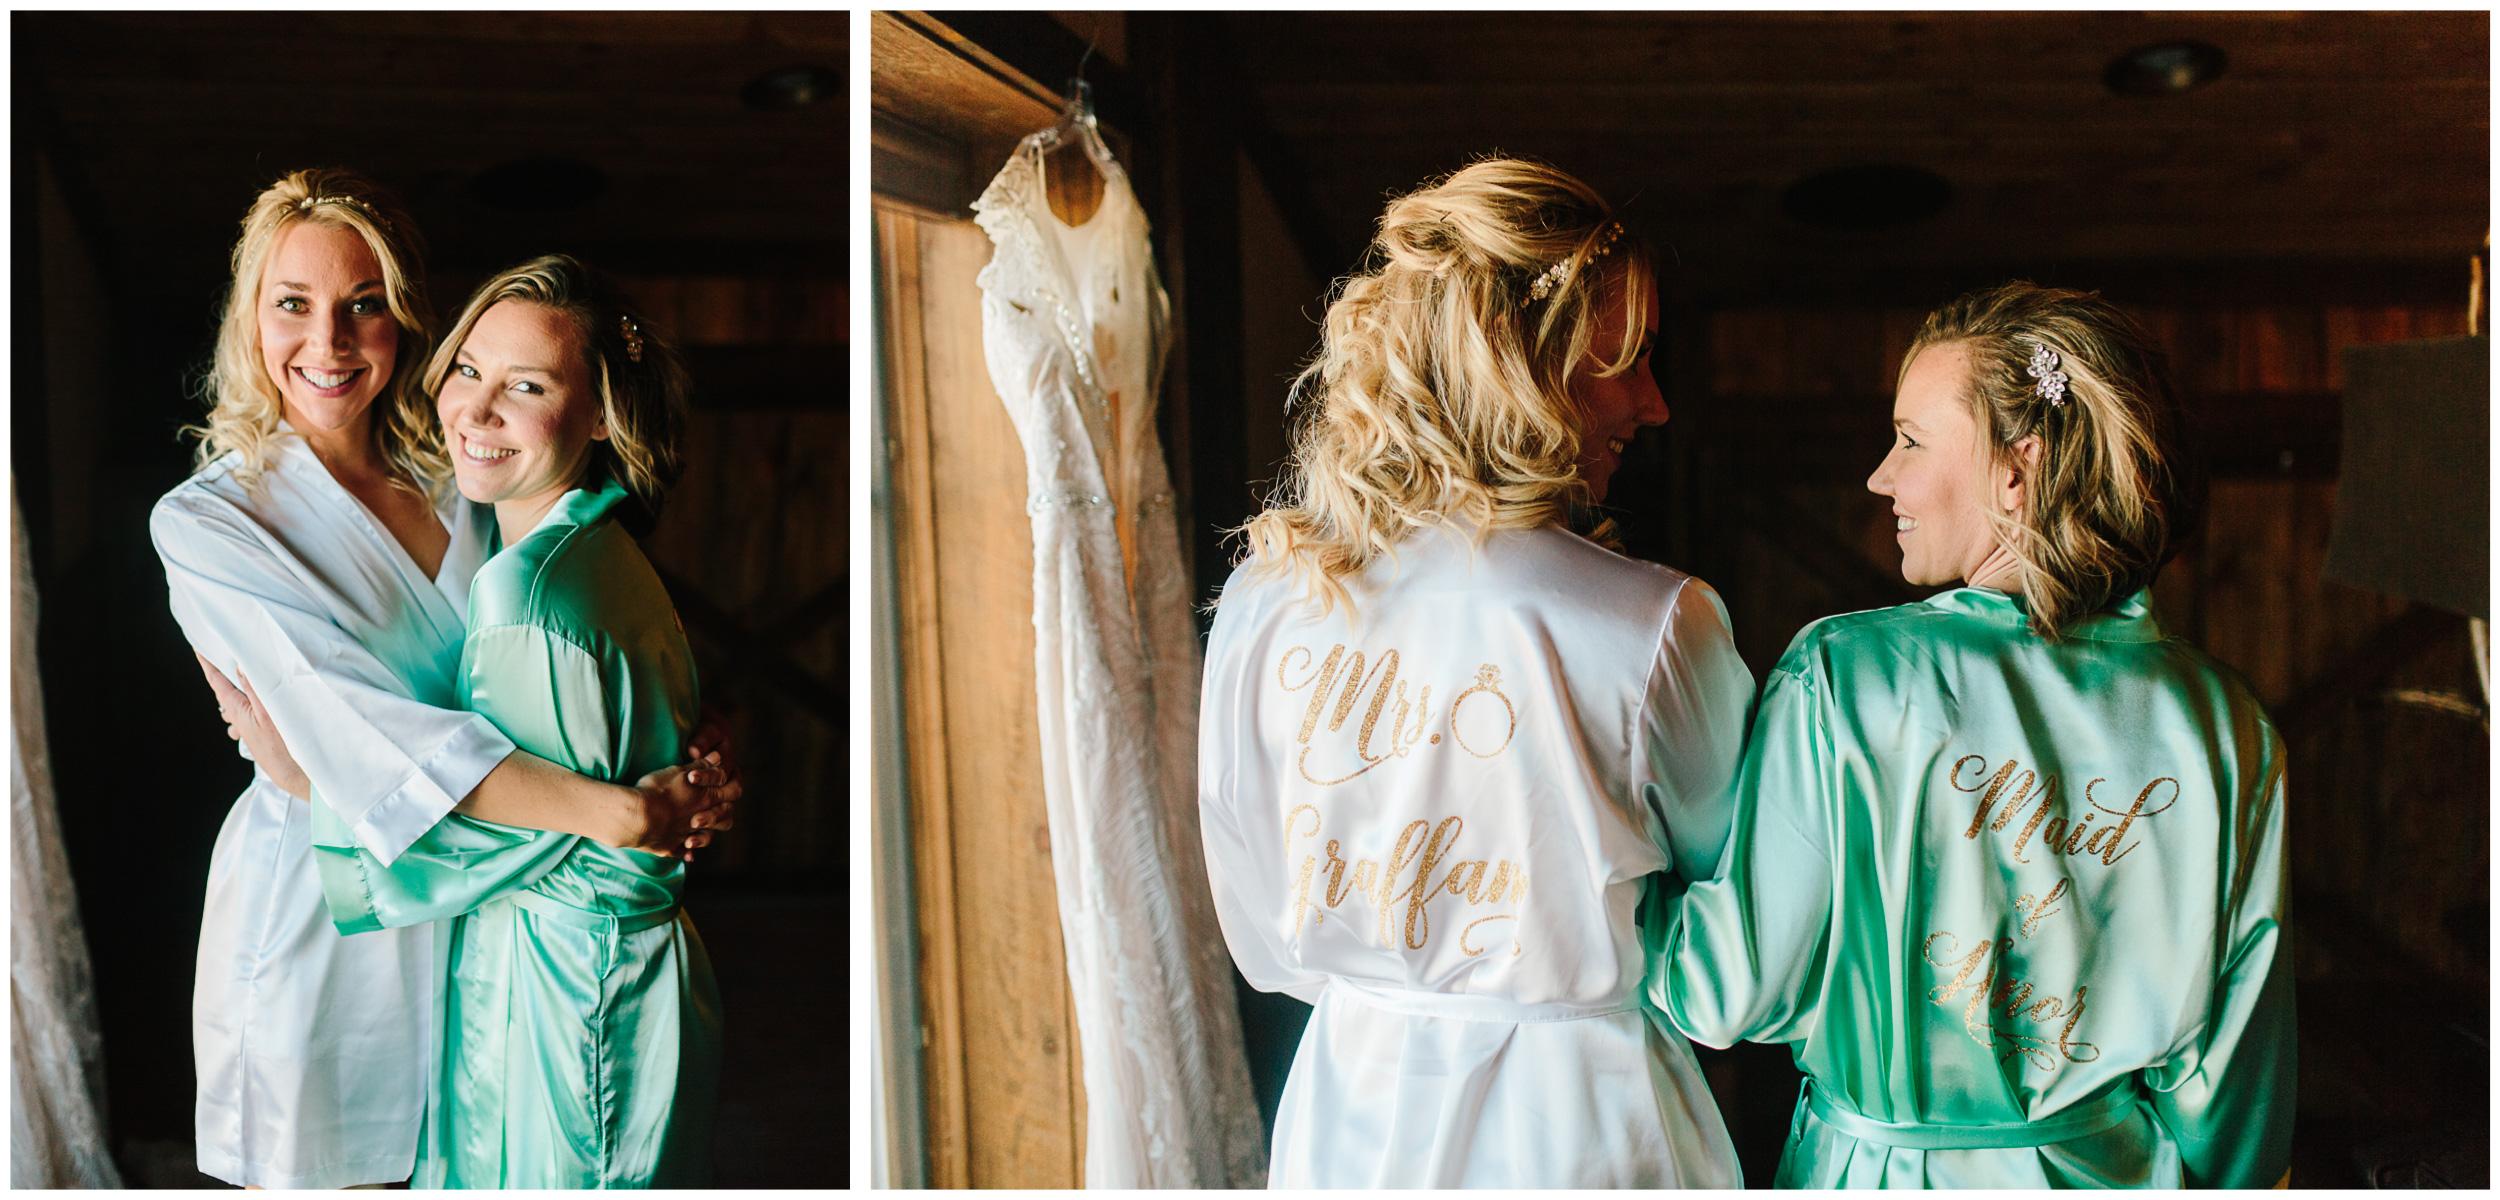 spruce_mountain_ranch_wedding_8.jpg